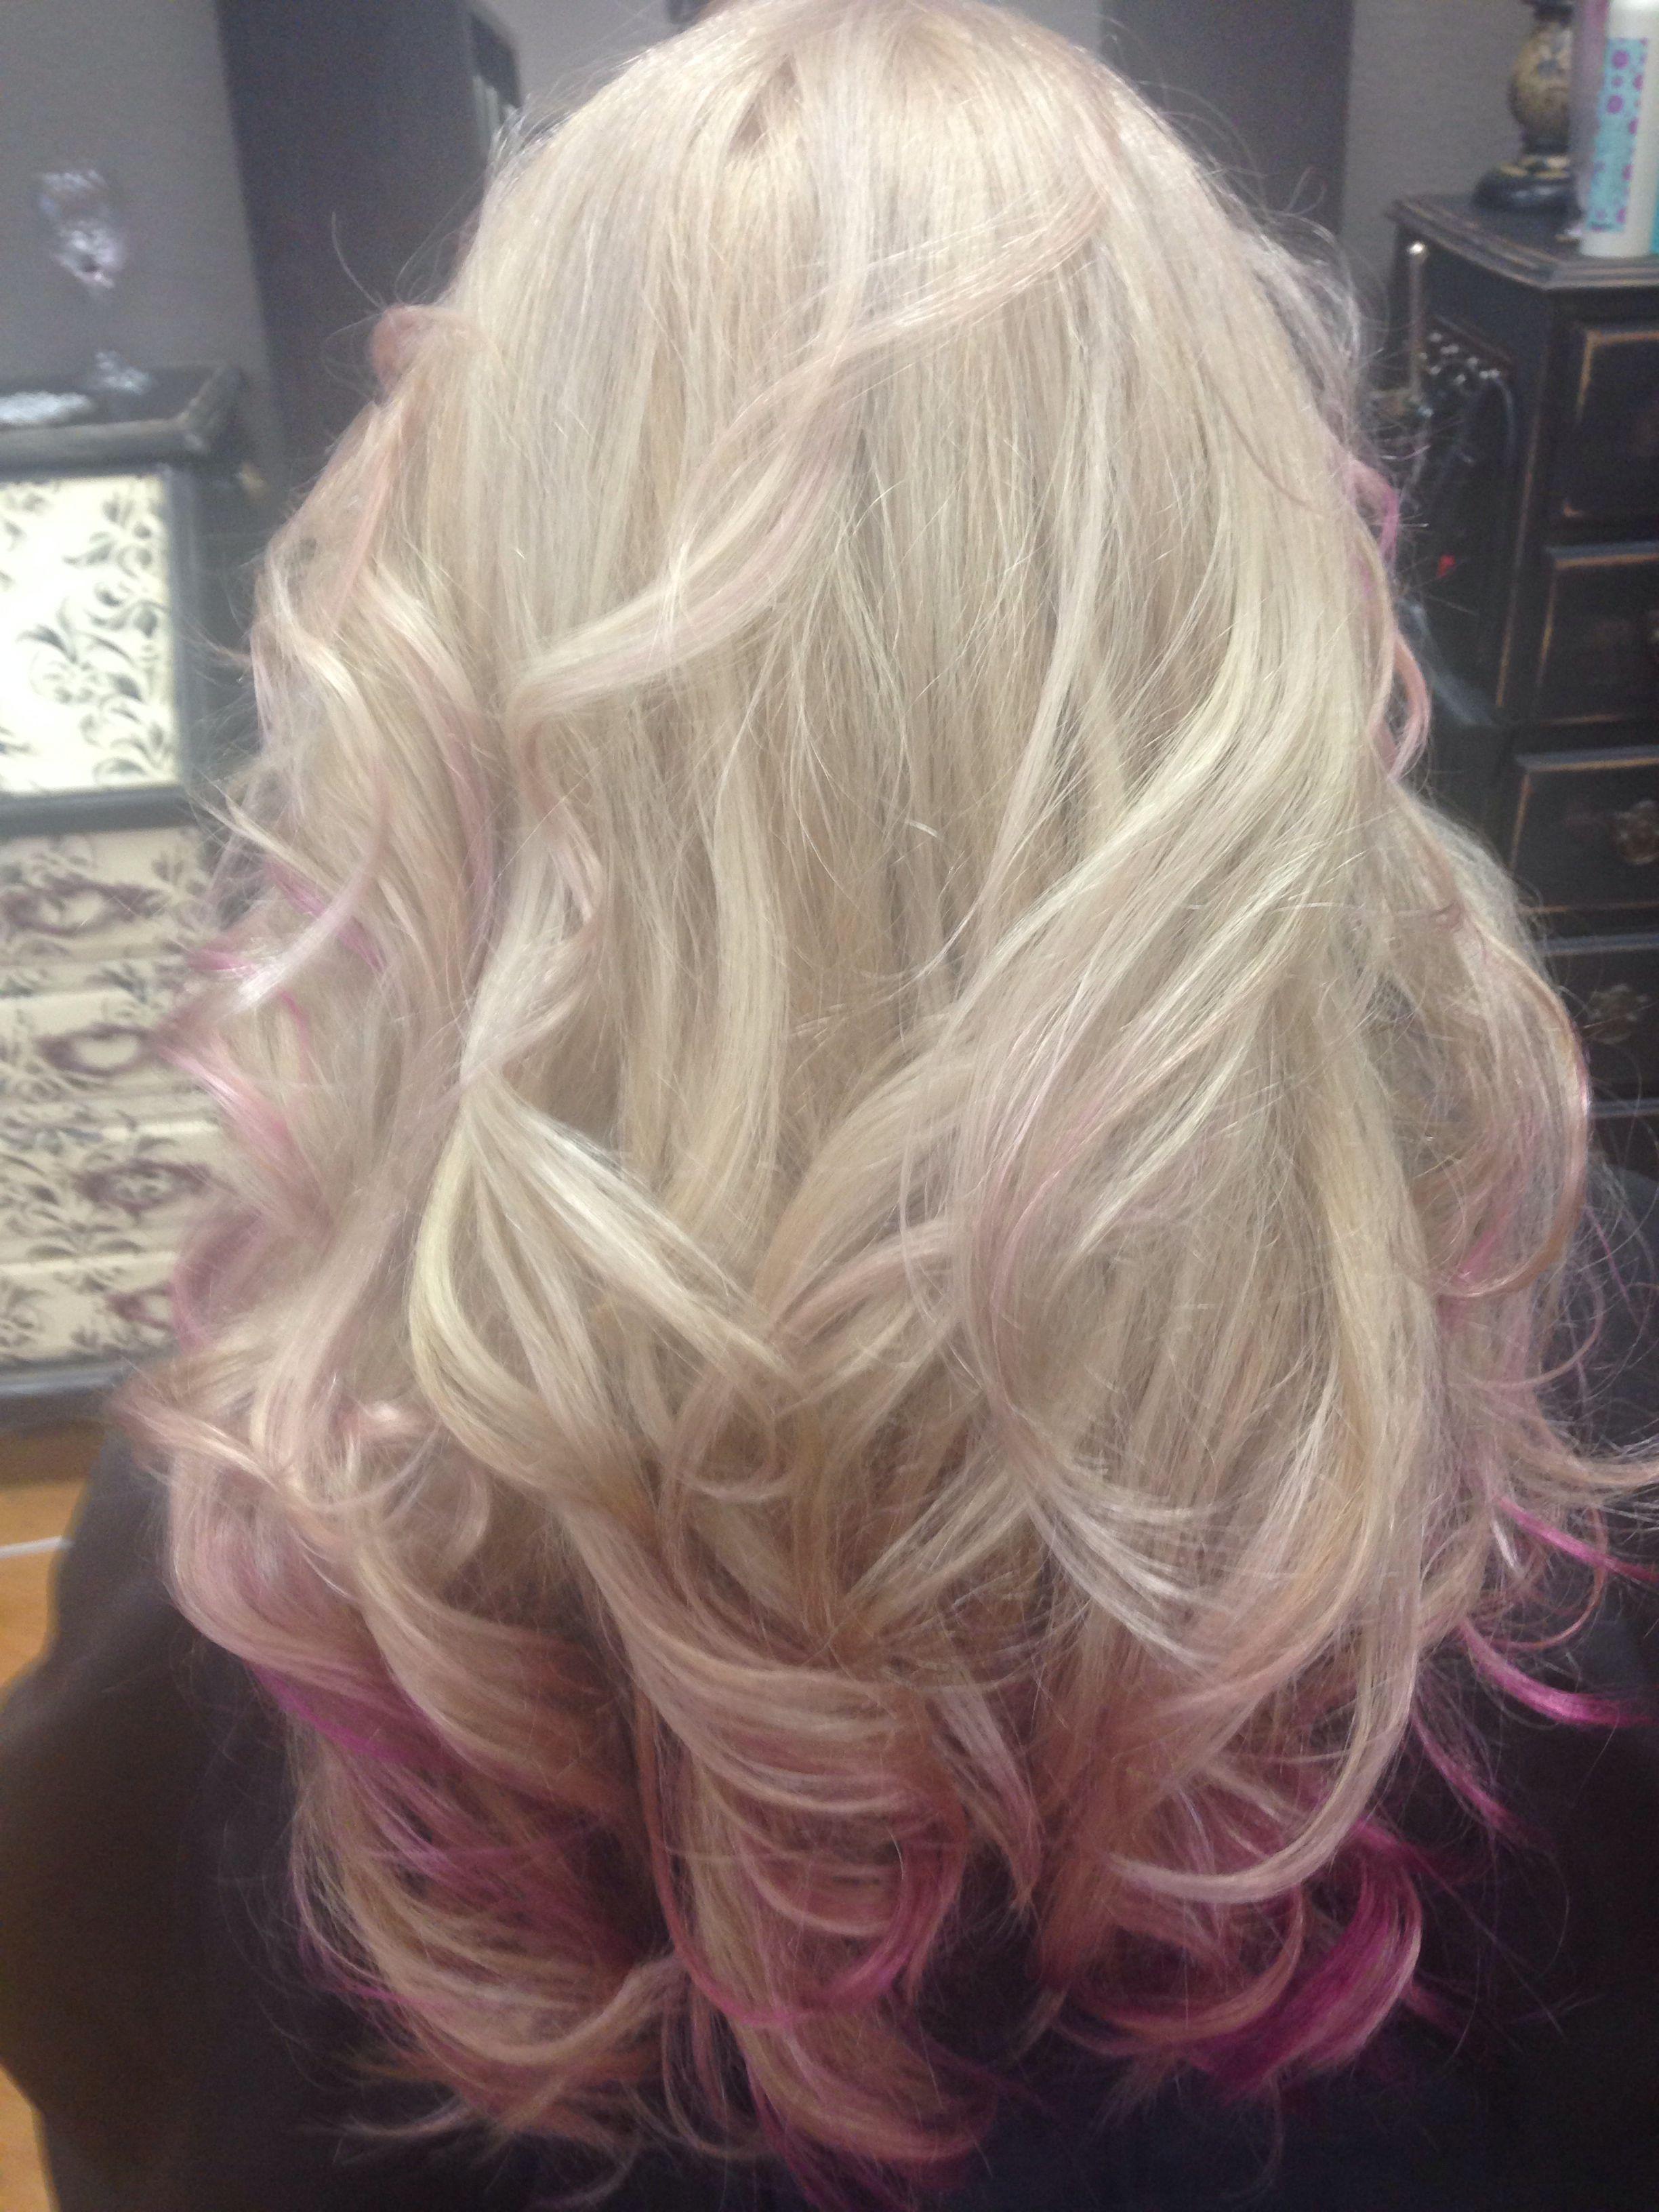 Cotton candy pink ombré davines anewcolor tresbellasalon boerne